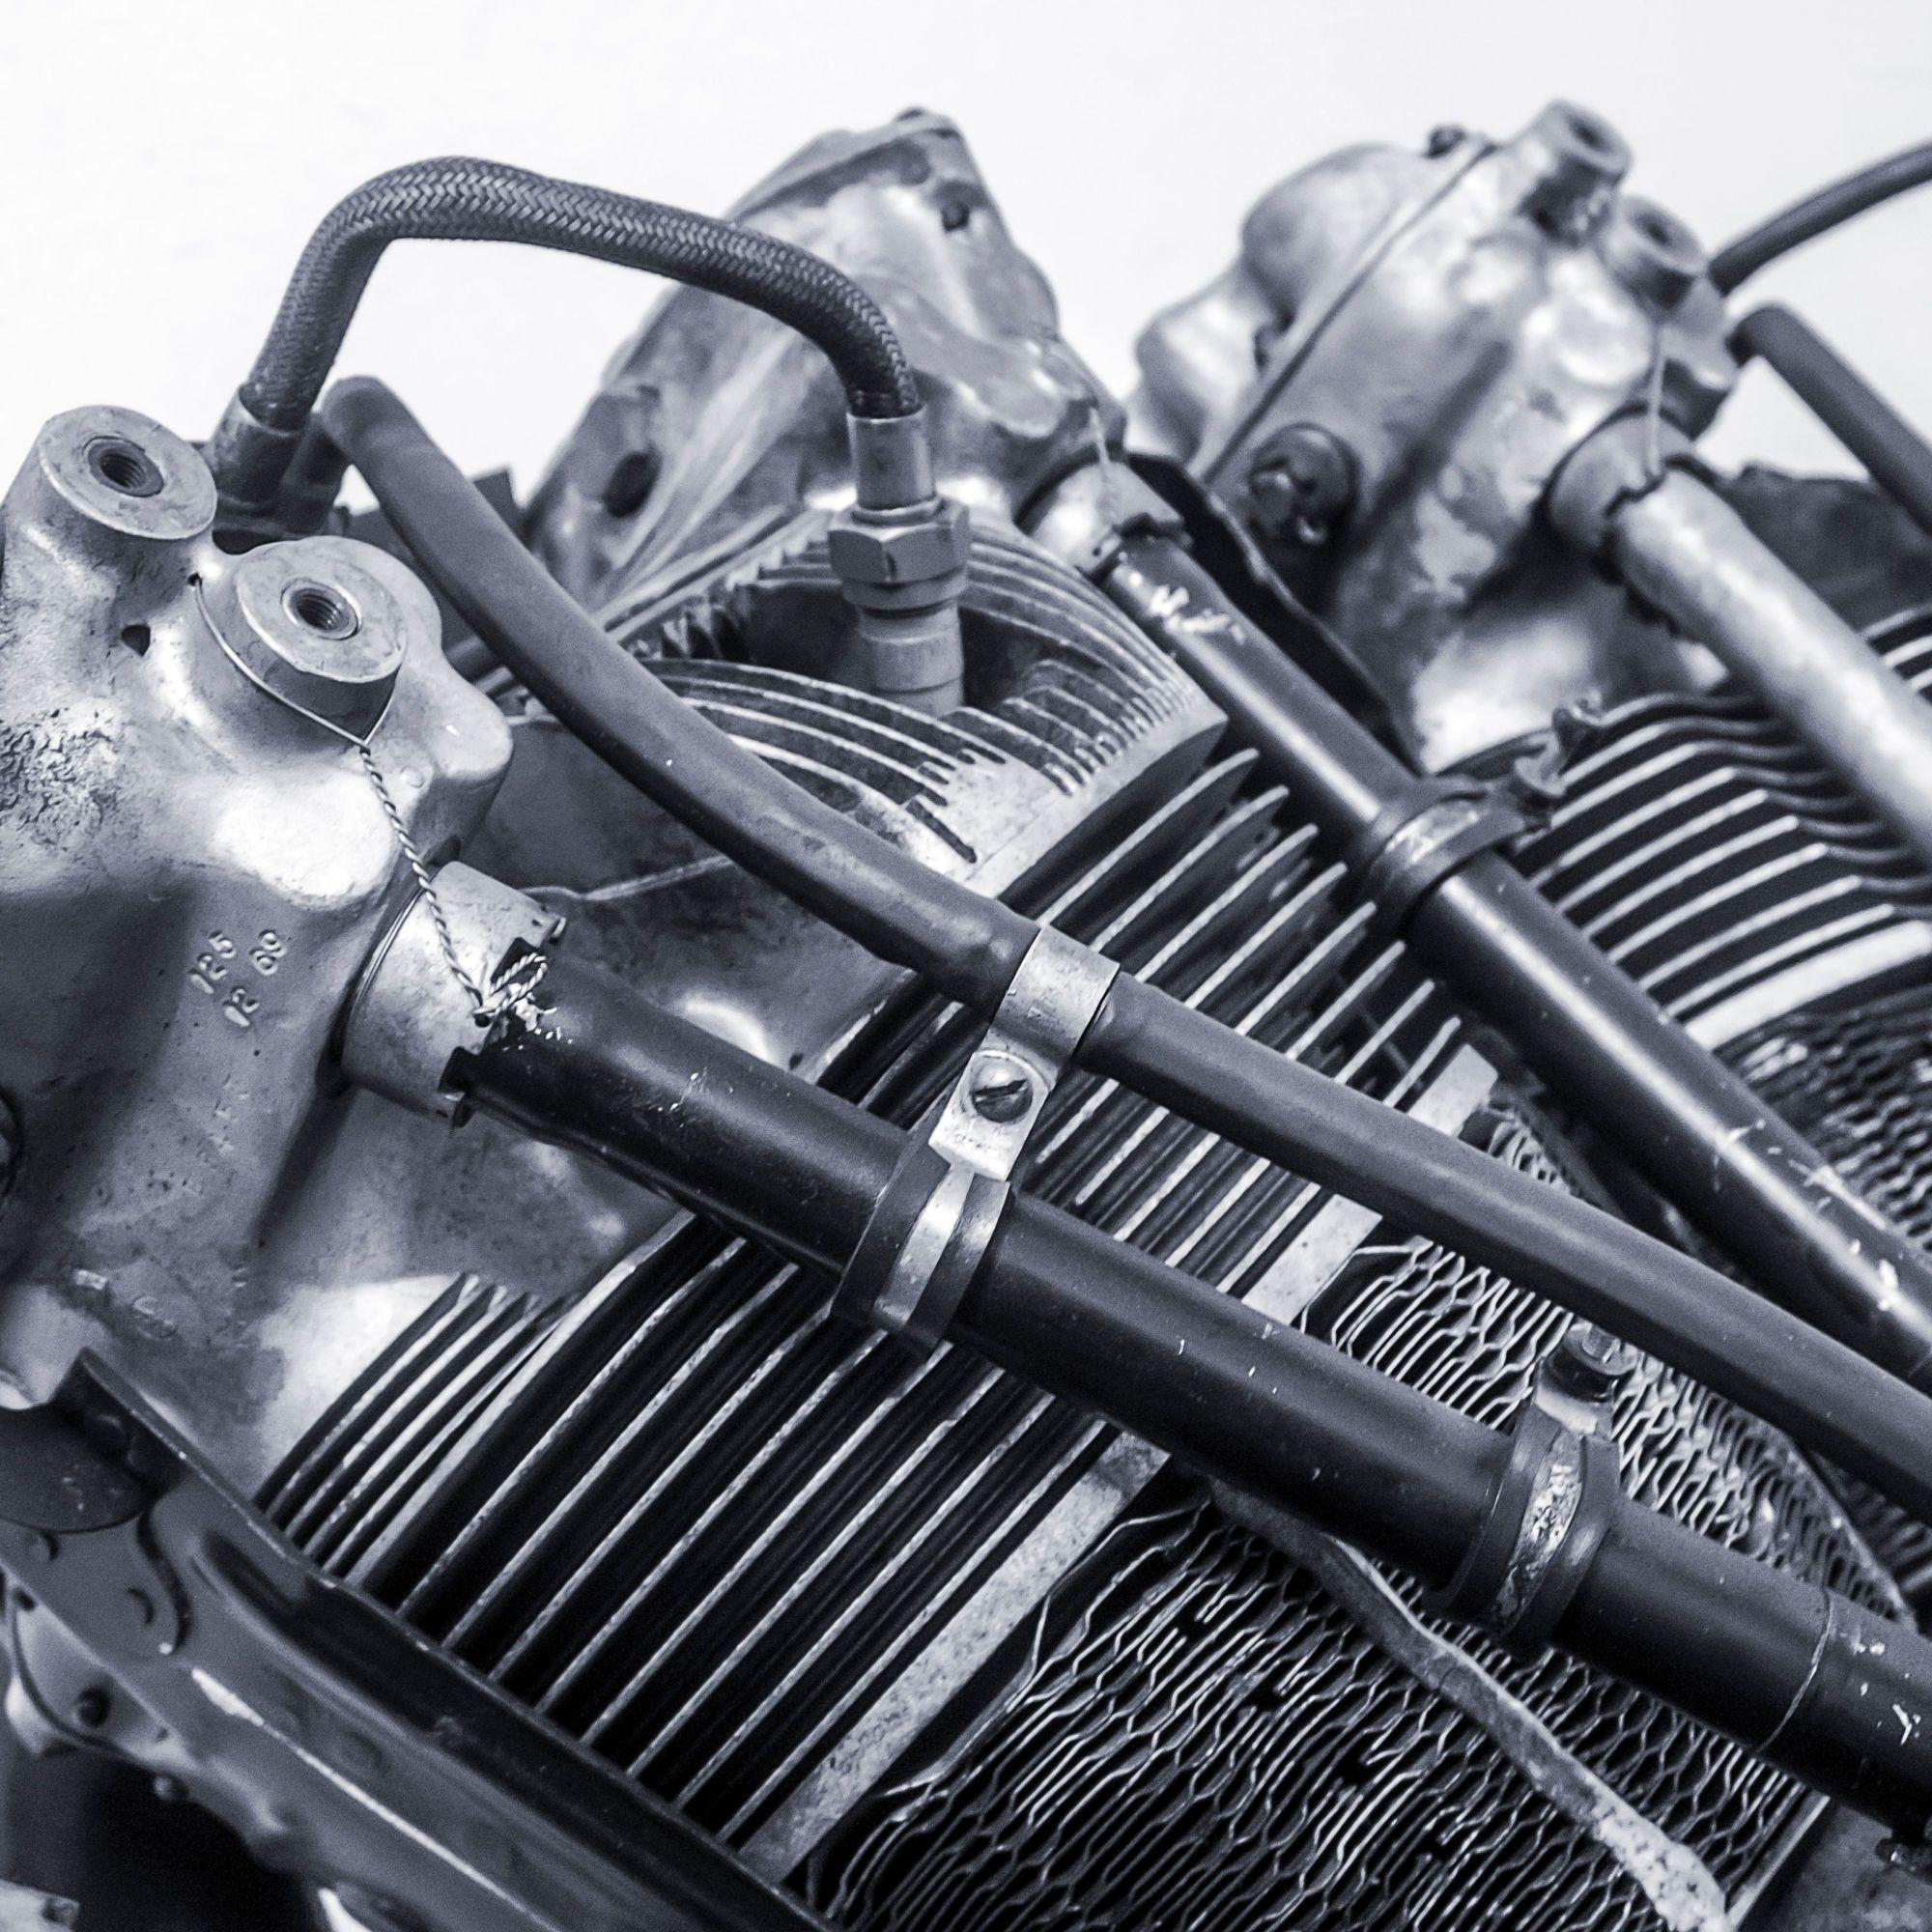 hight resolution of small bike engine diagram